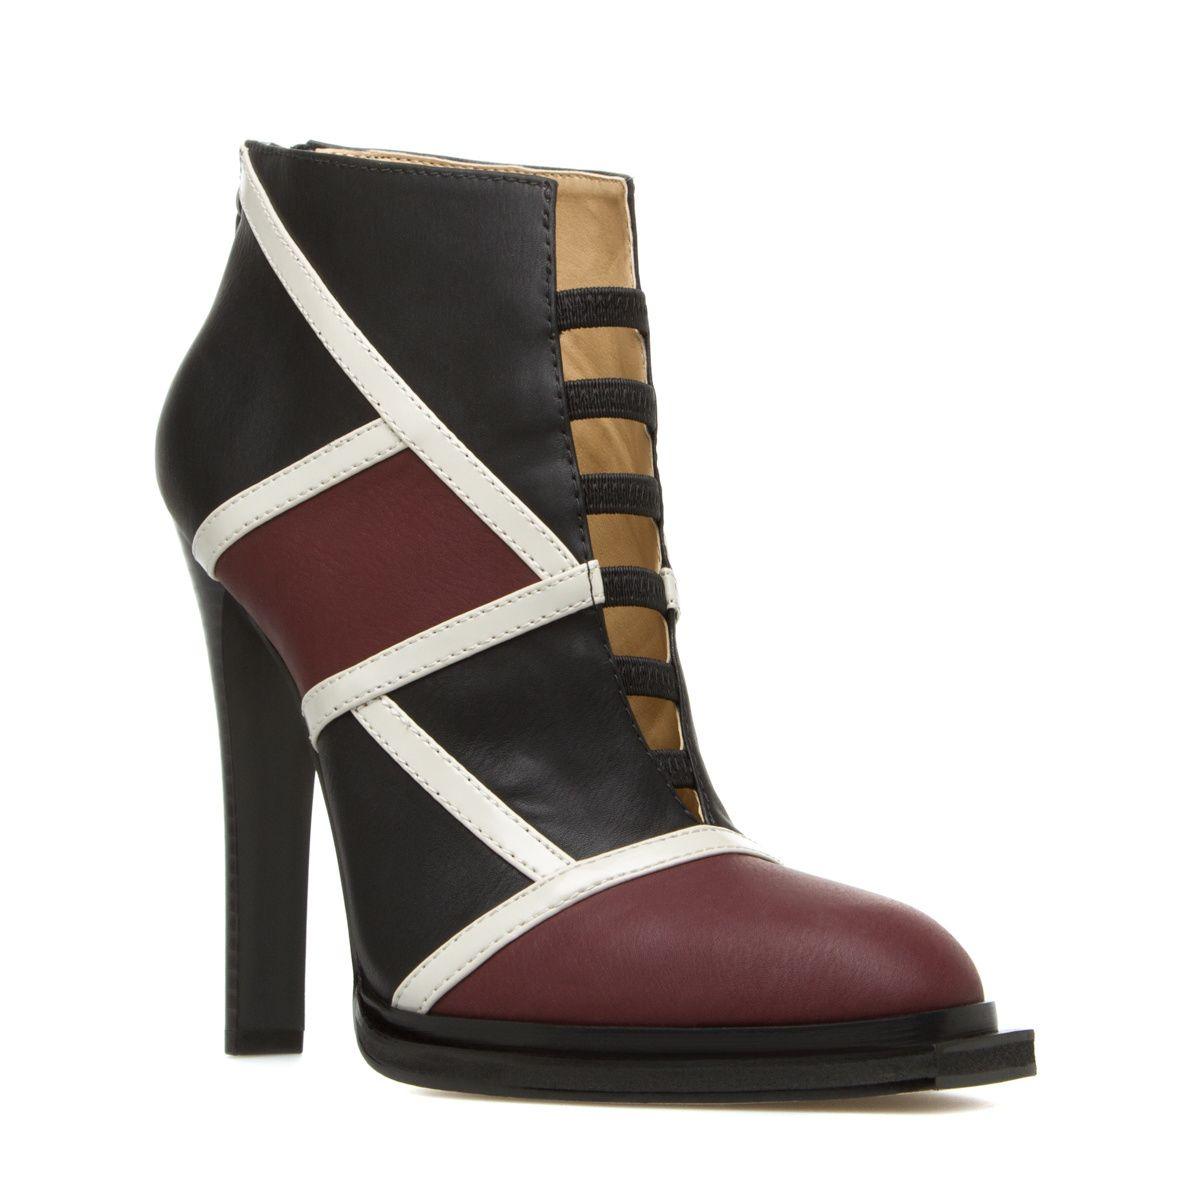 Masako - ShoeDazzle